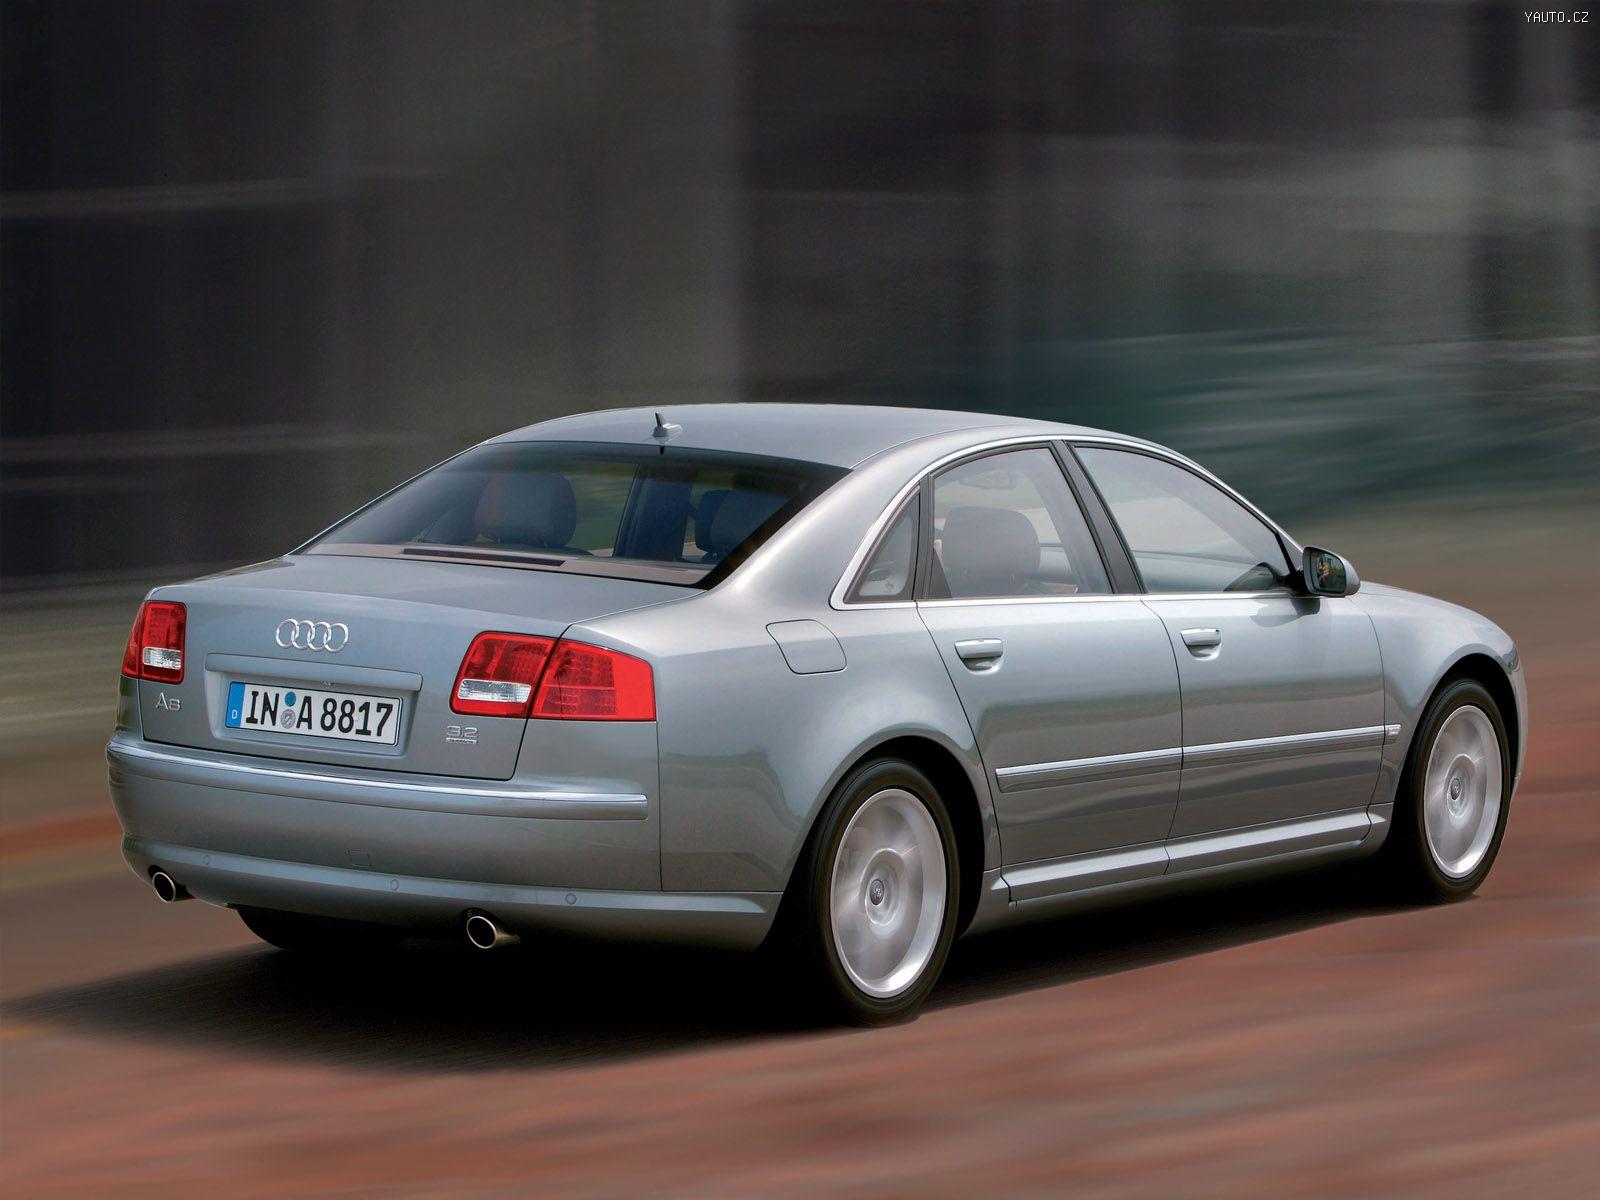 Audi A8 2005 Auta Na Plochu Tapety Na Plochu Wallpapers